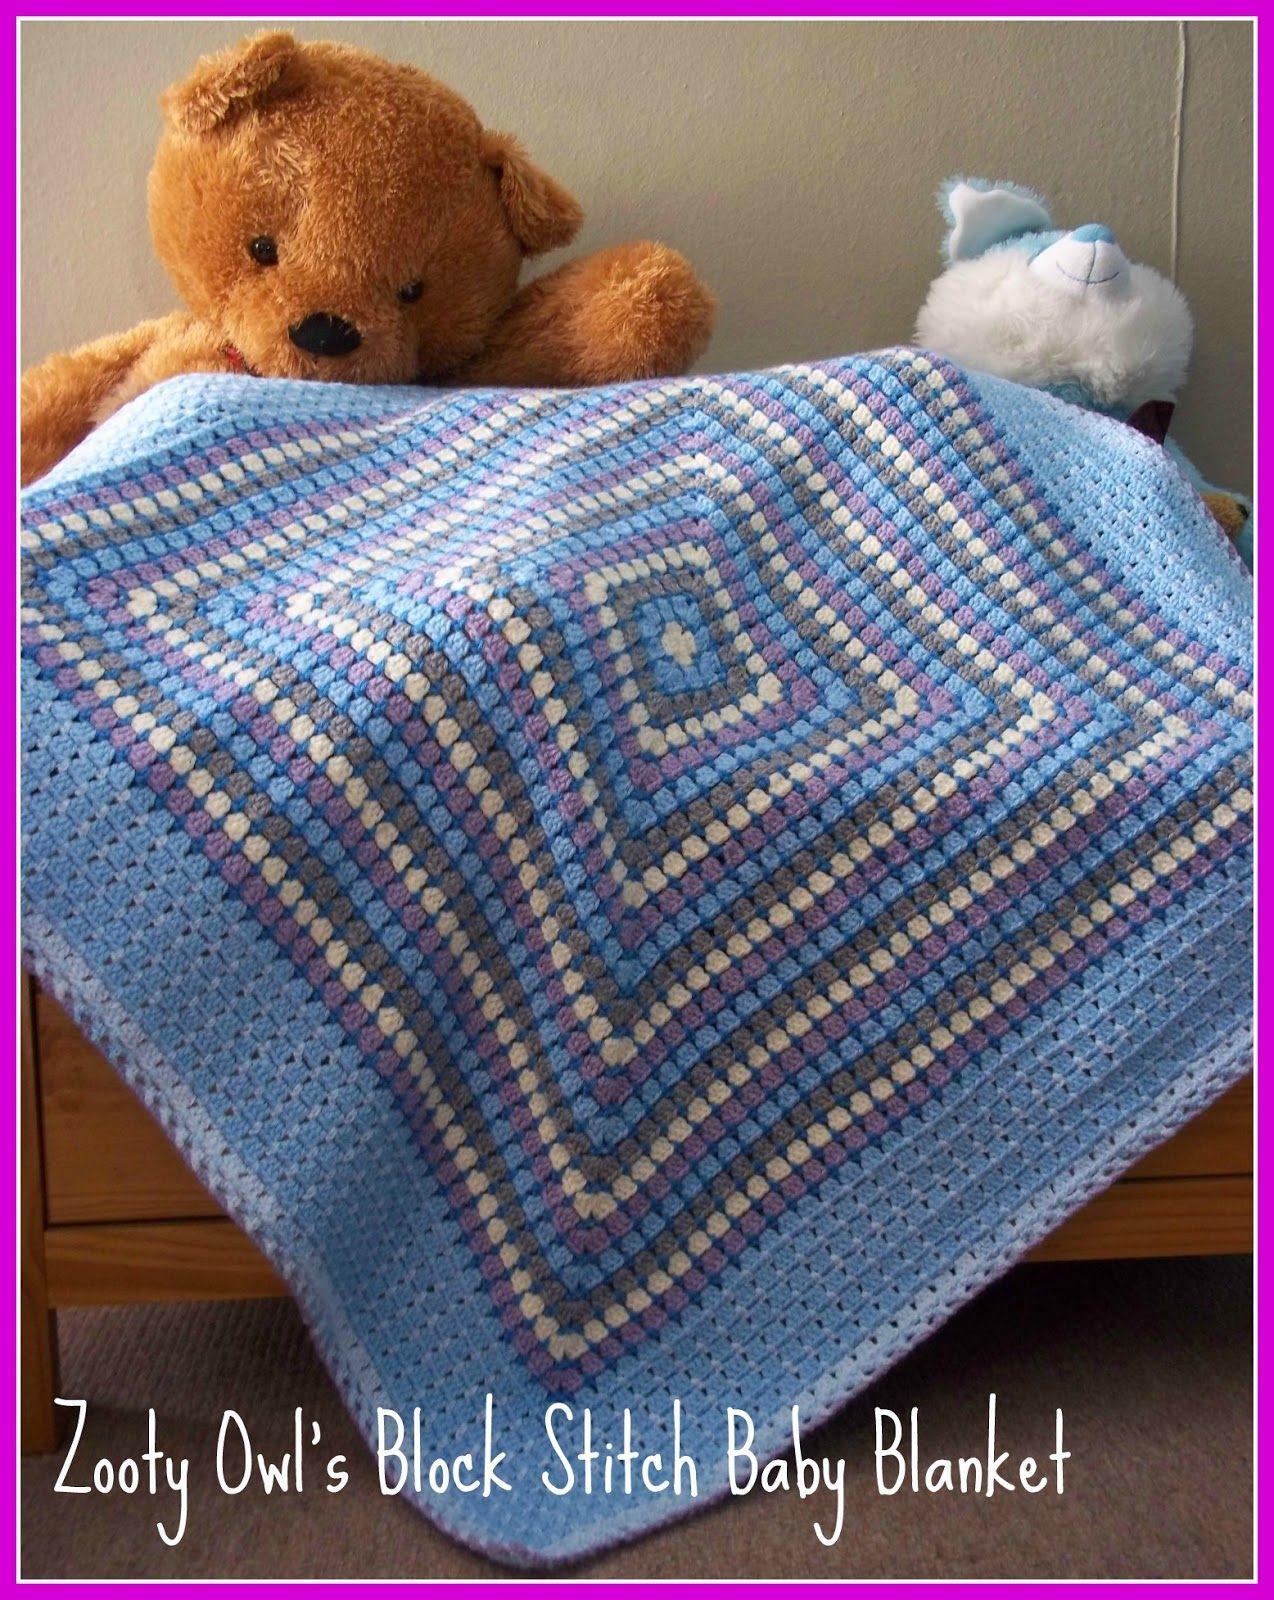 Zooty owls crafty blog block stitch baby blanket tutorial zooty owls crafty blog block stitch baby blanket tutorial bankloansurffo Image collections